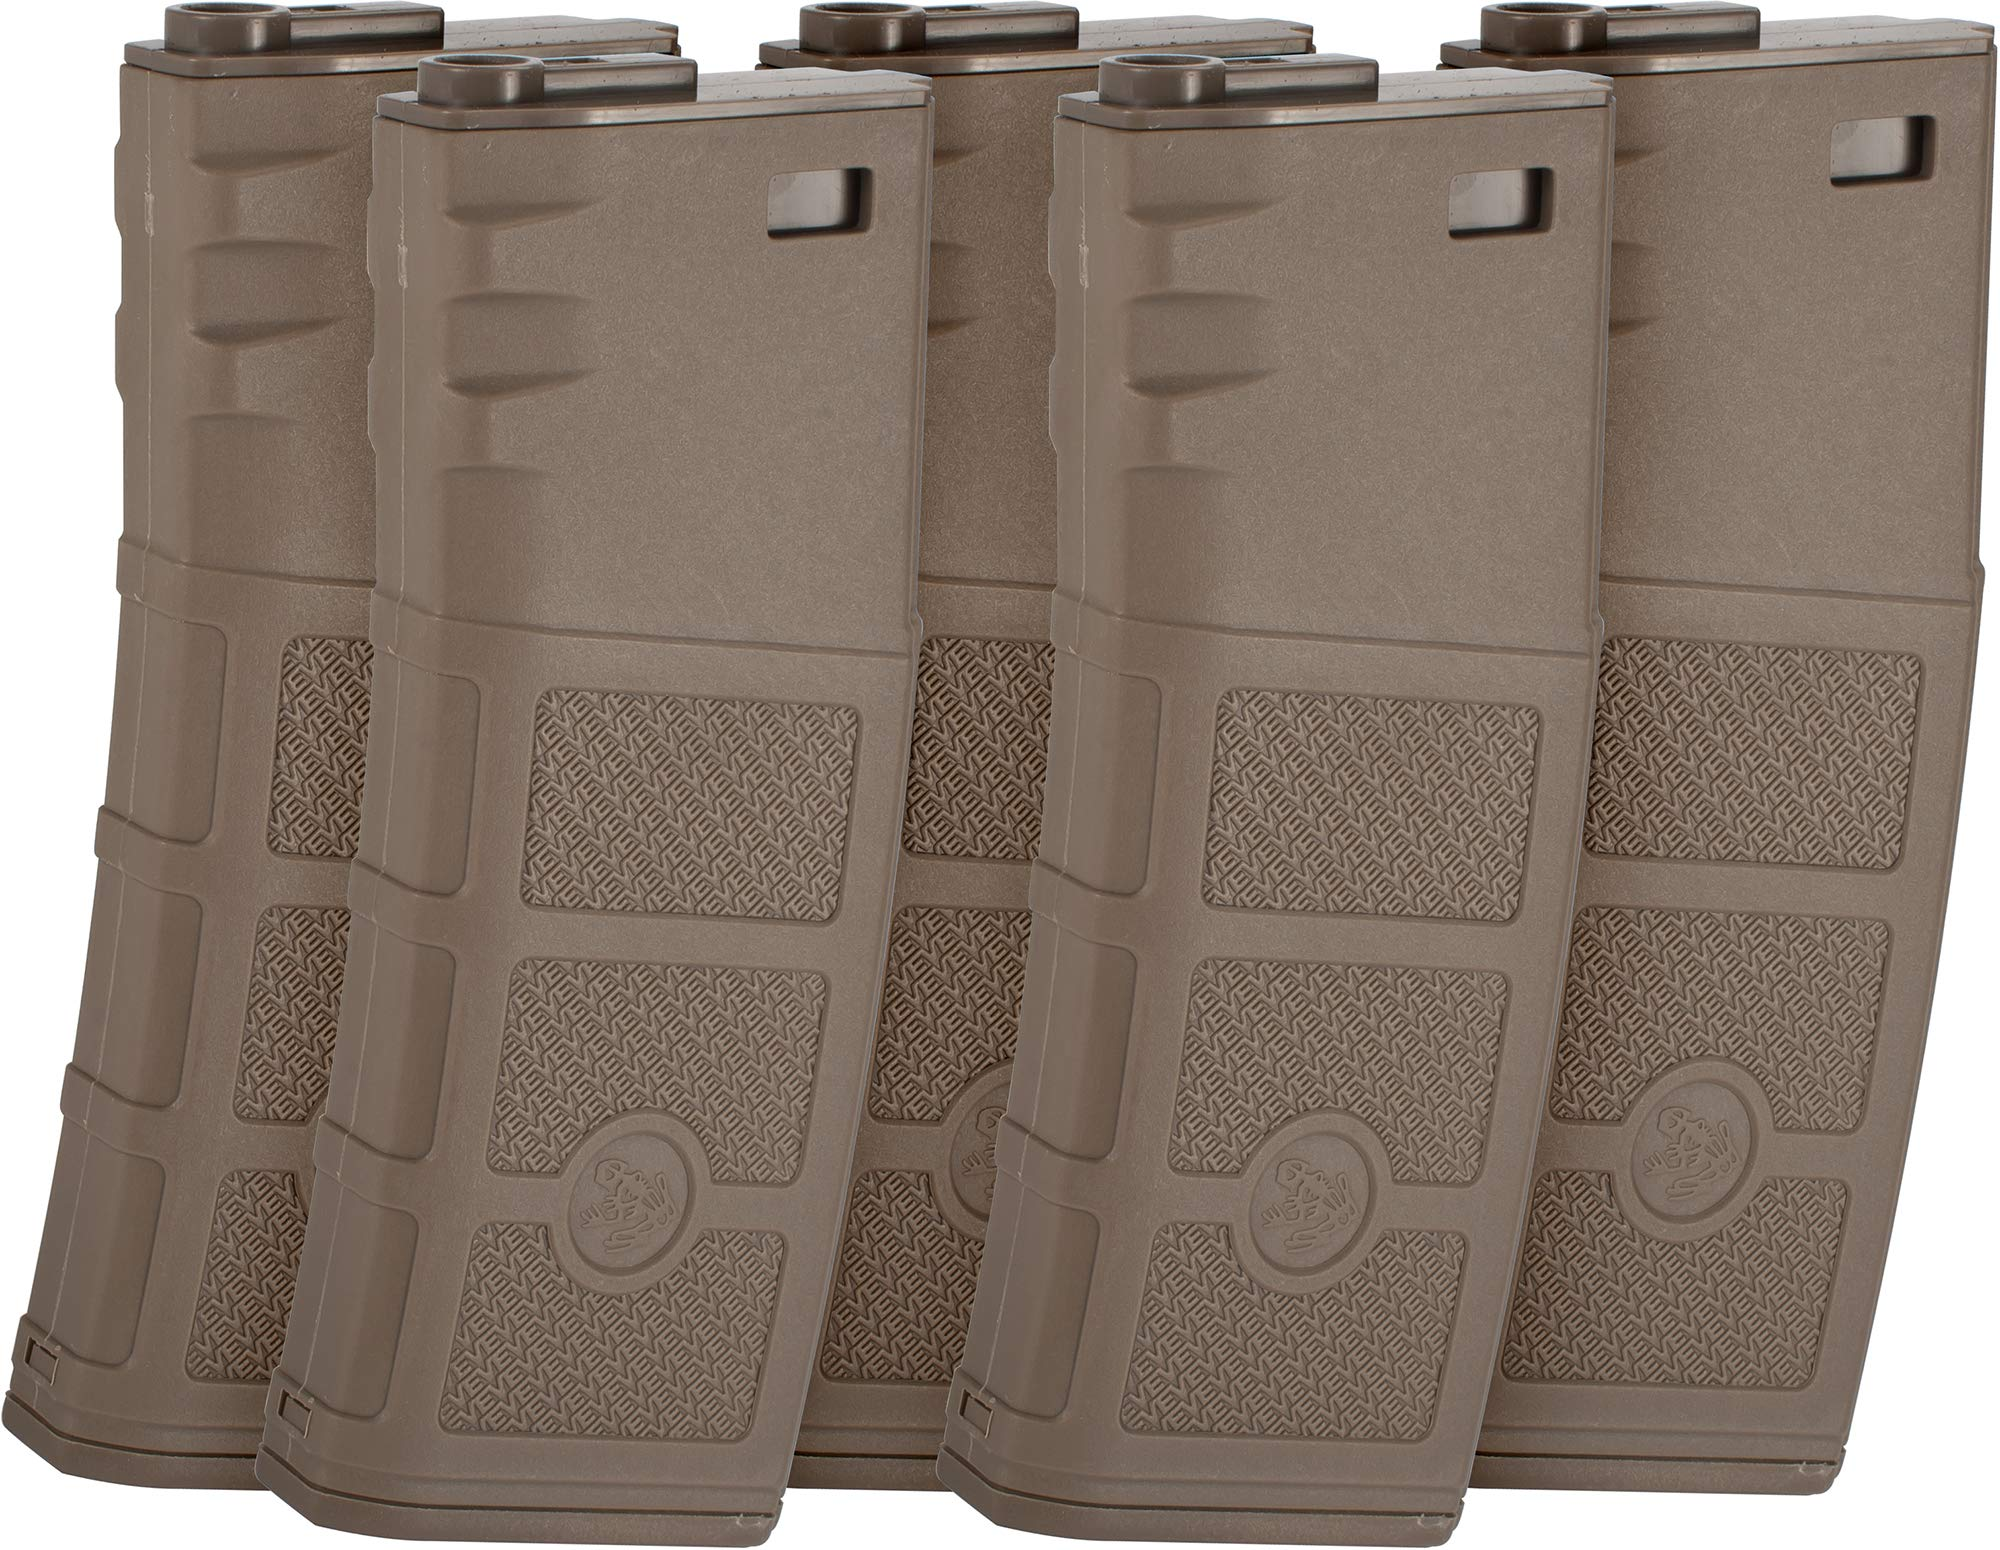 Evike G&P High RPS Polymer Magazine for M4 M16 Airsoft AEG Rifles (Type: 360rd Hi-Cap/Dark Earth / 5 Pack) by Evike